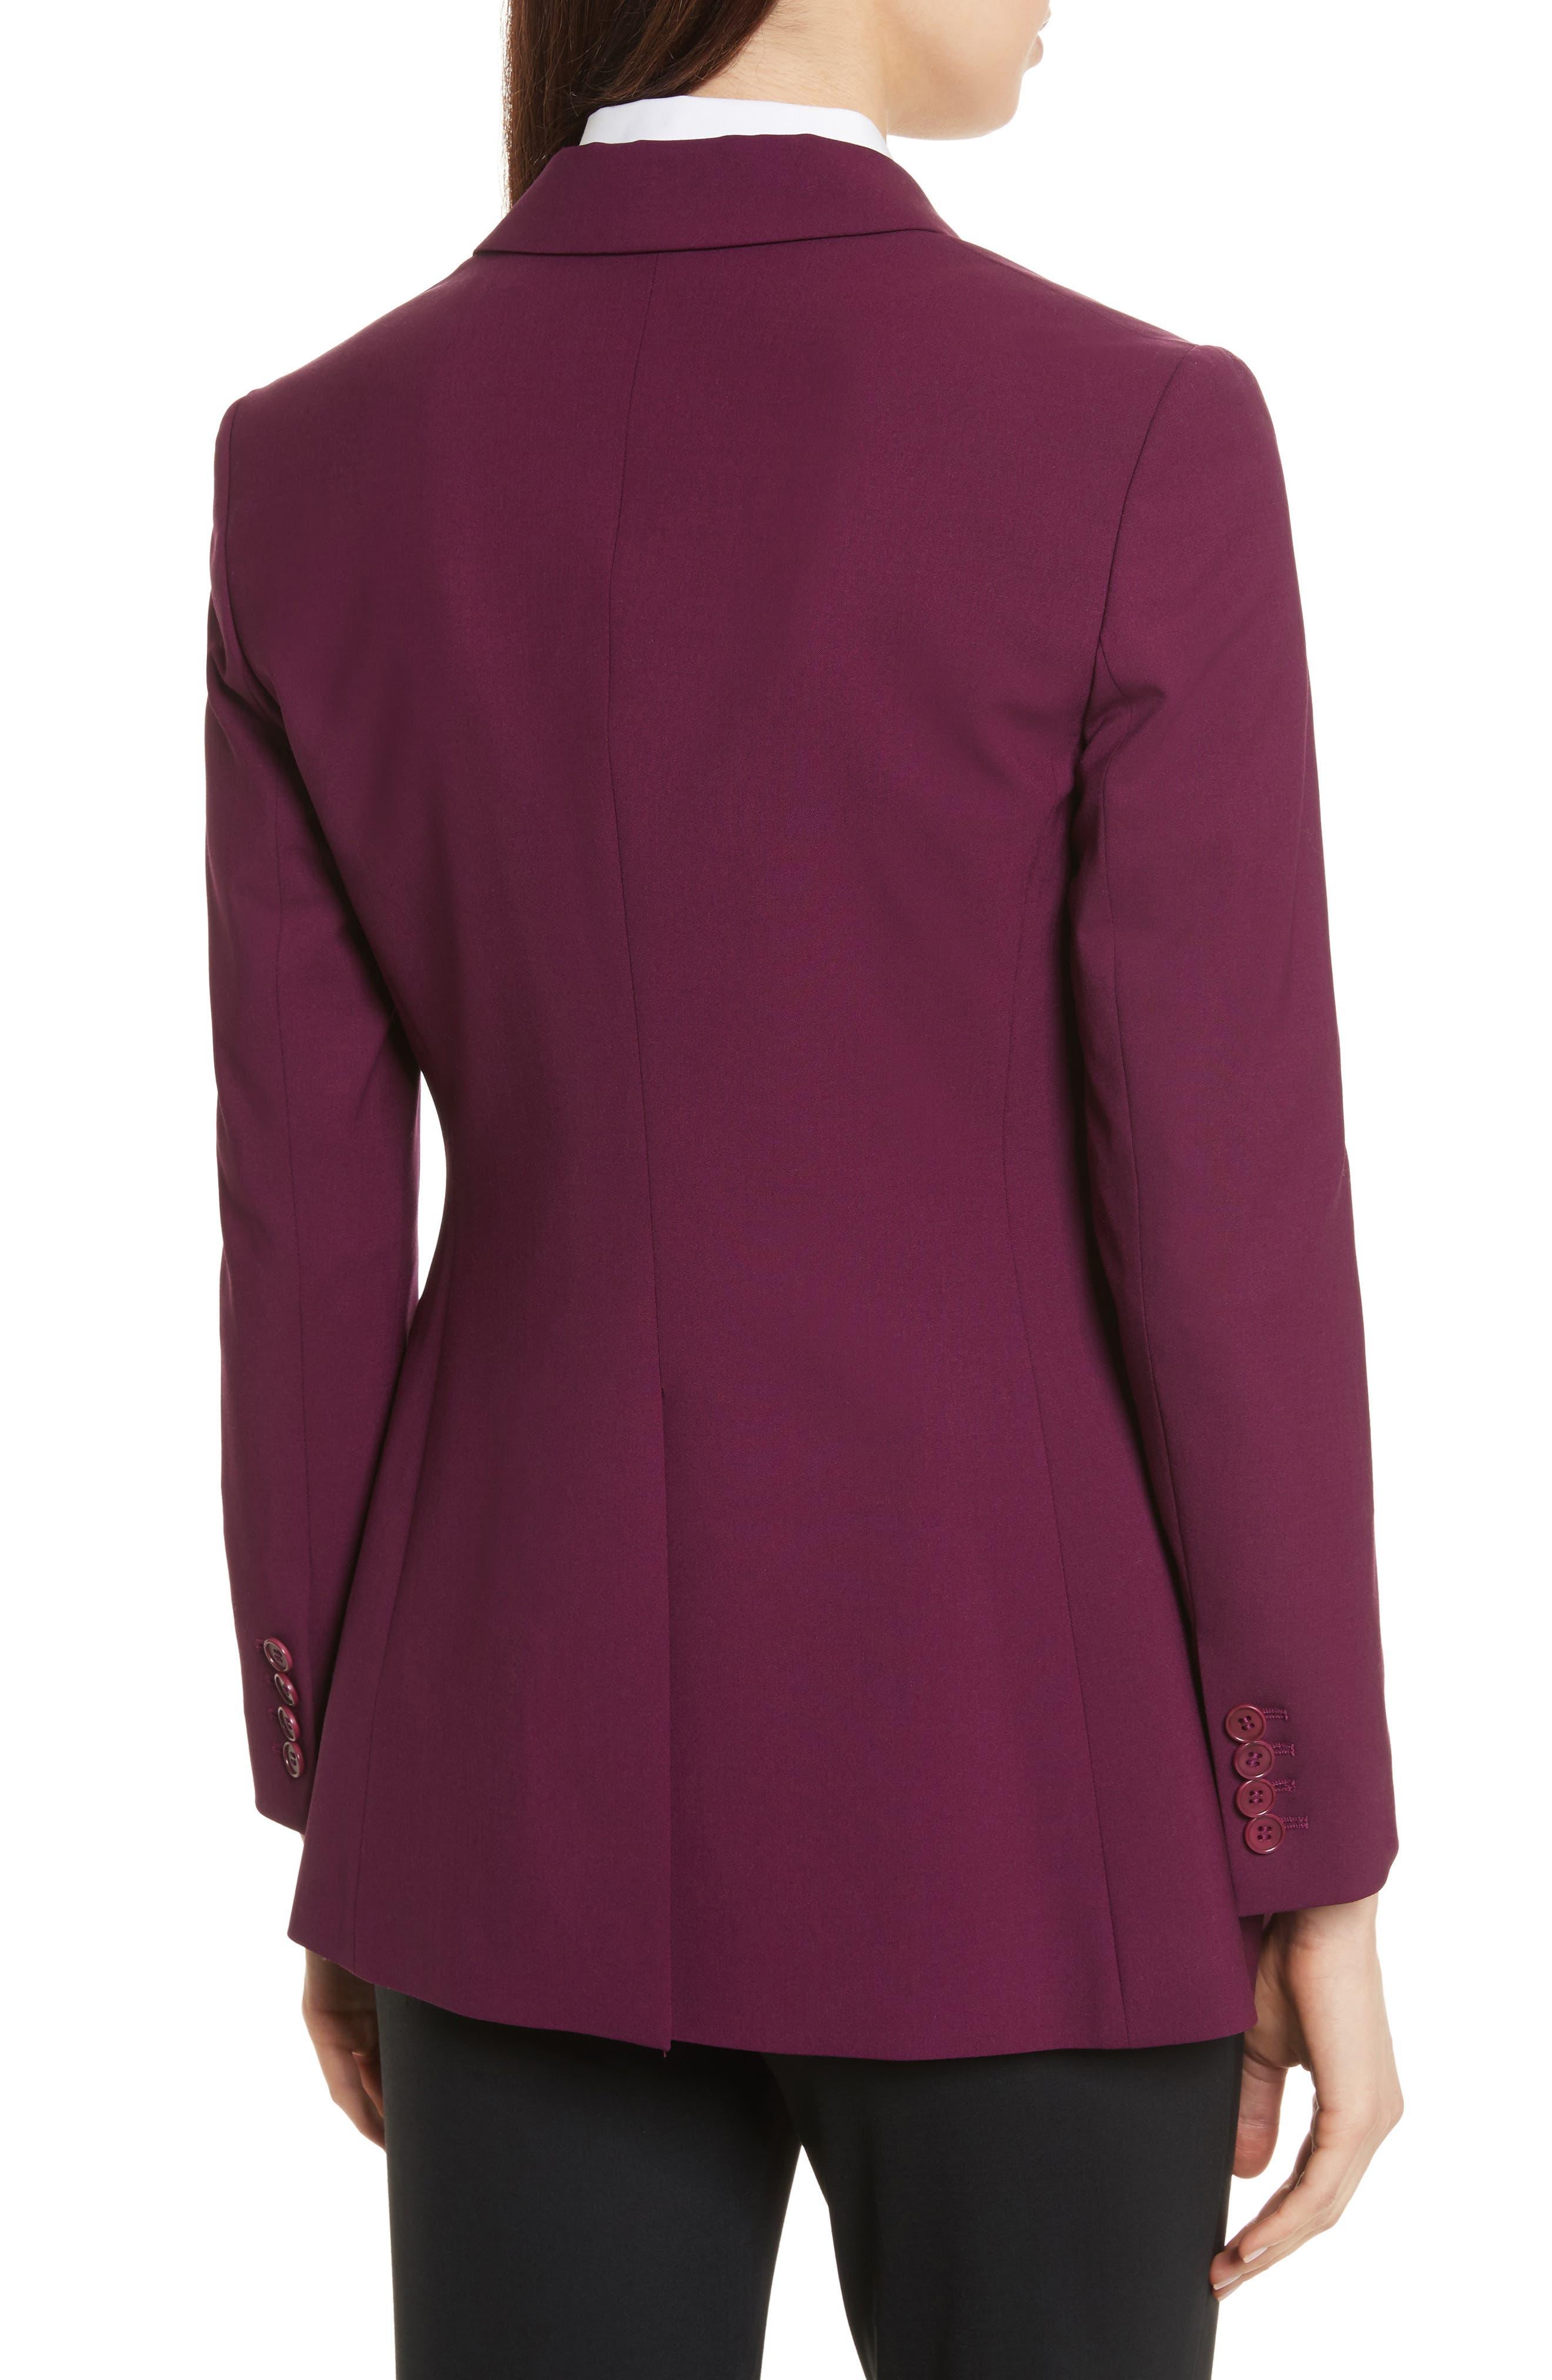 Etienette B Good Wool Suit Jacket,                             Alternate thumbnail 13, color,